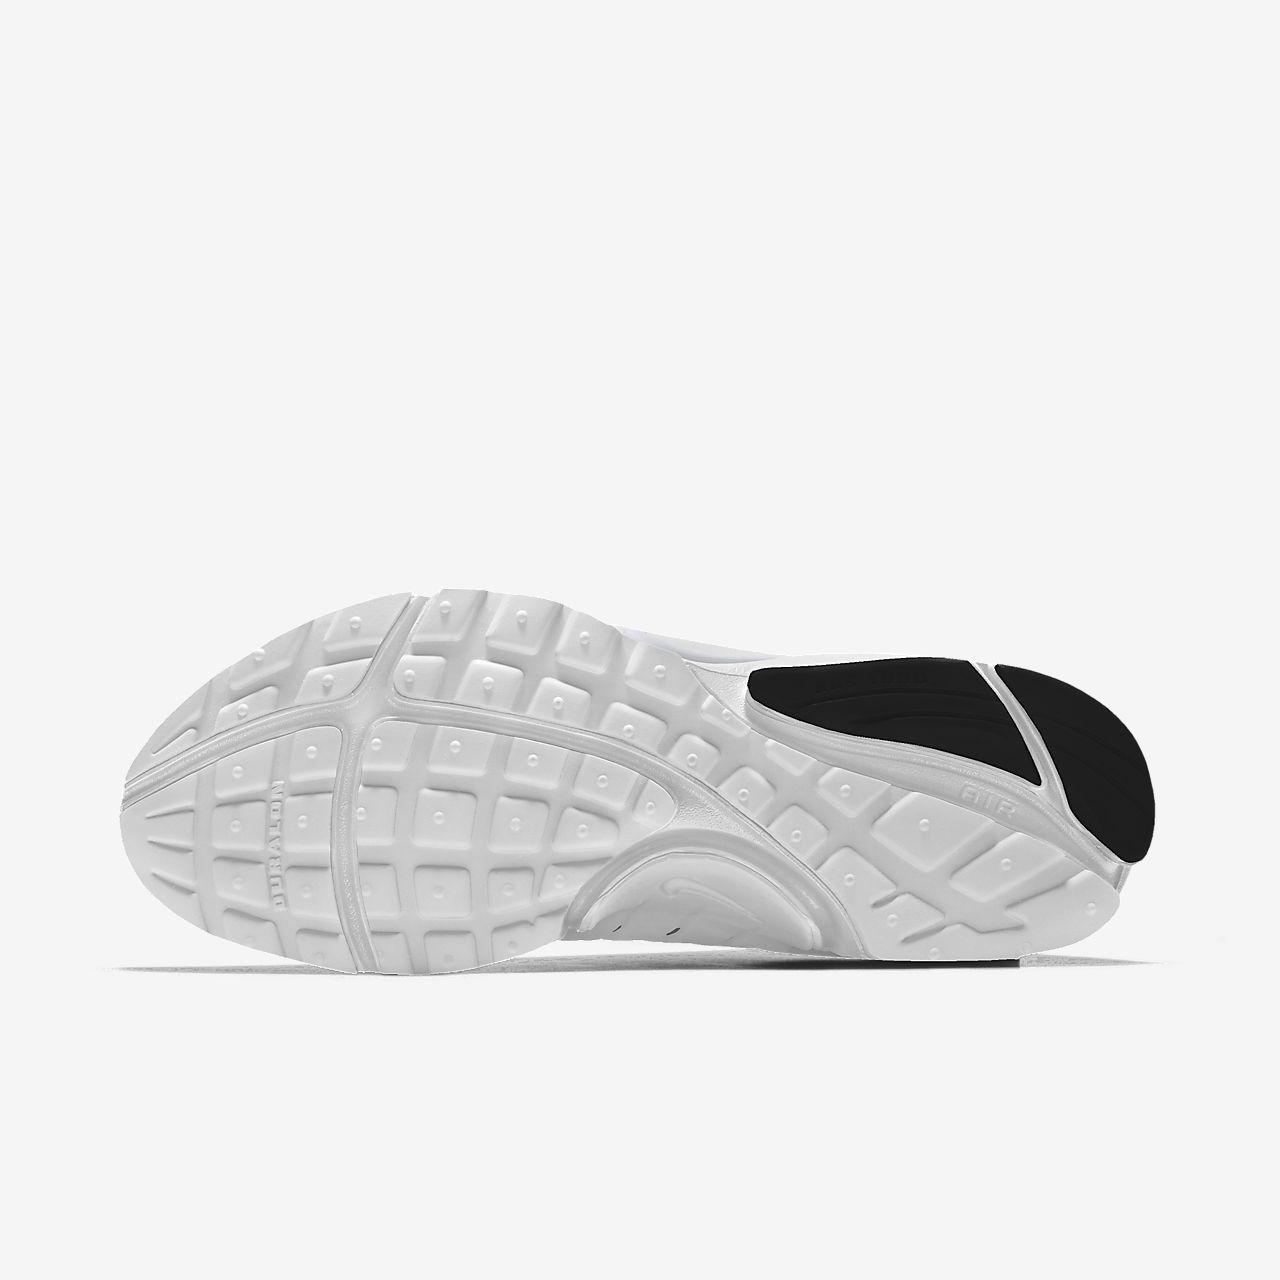 Nike Air Presto By You Custom Shoe